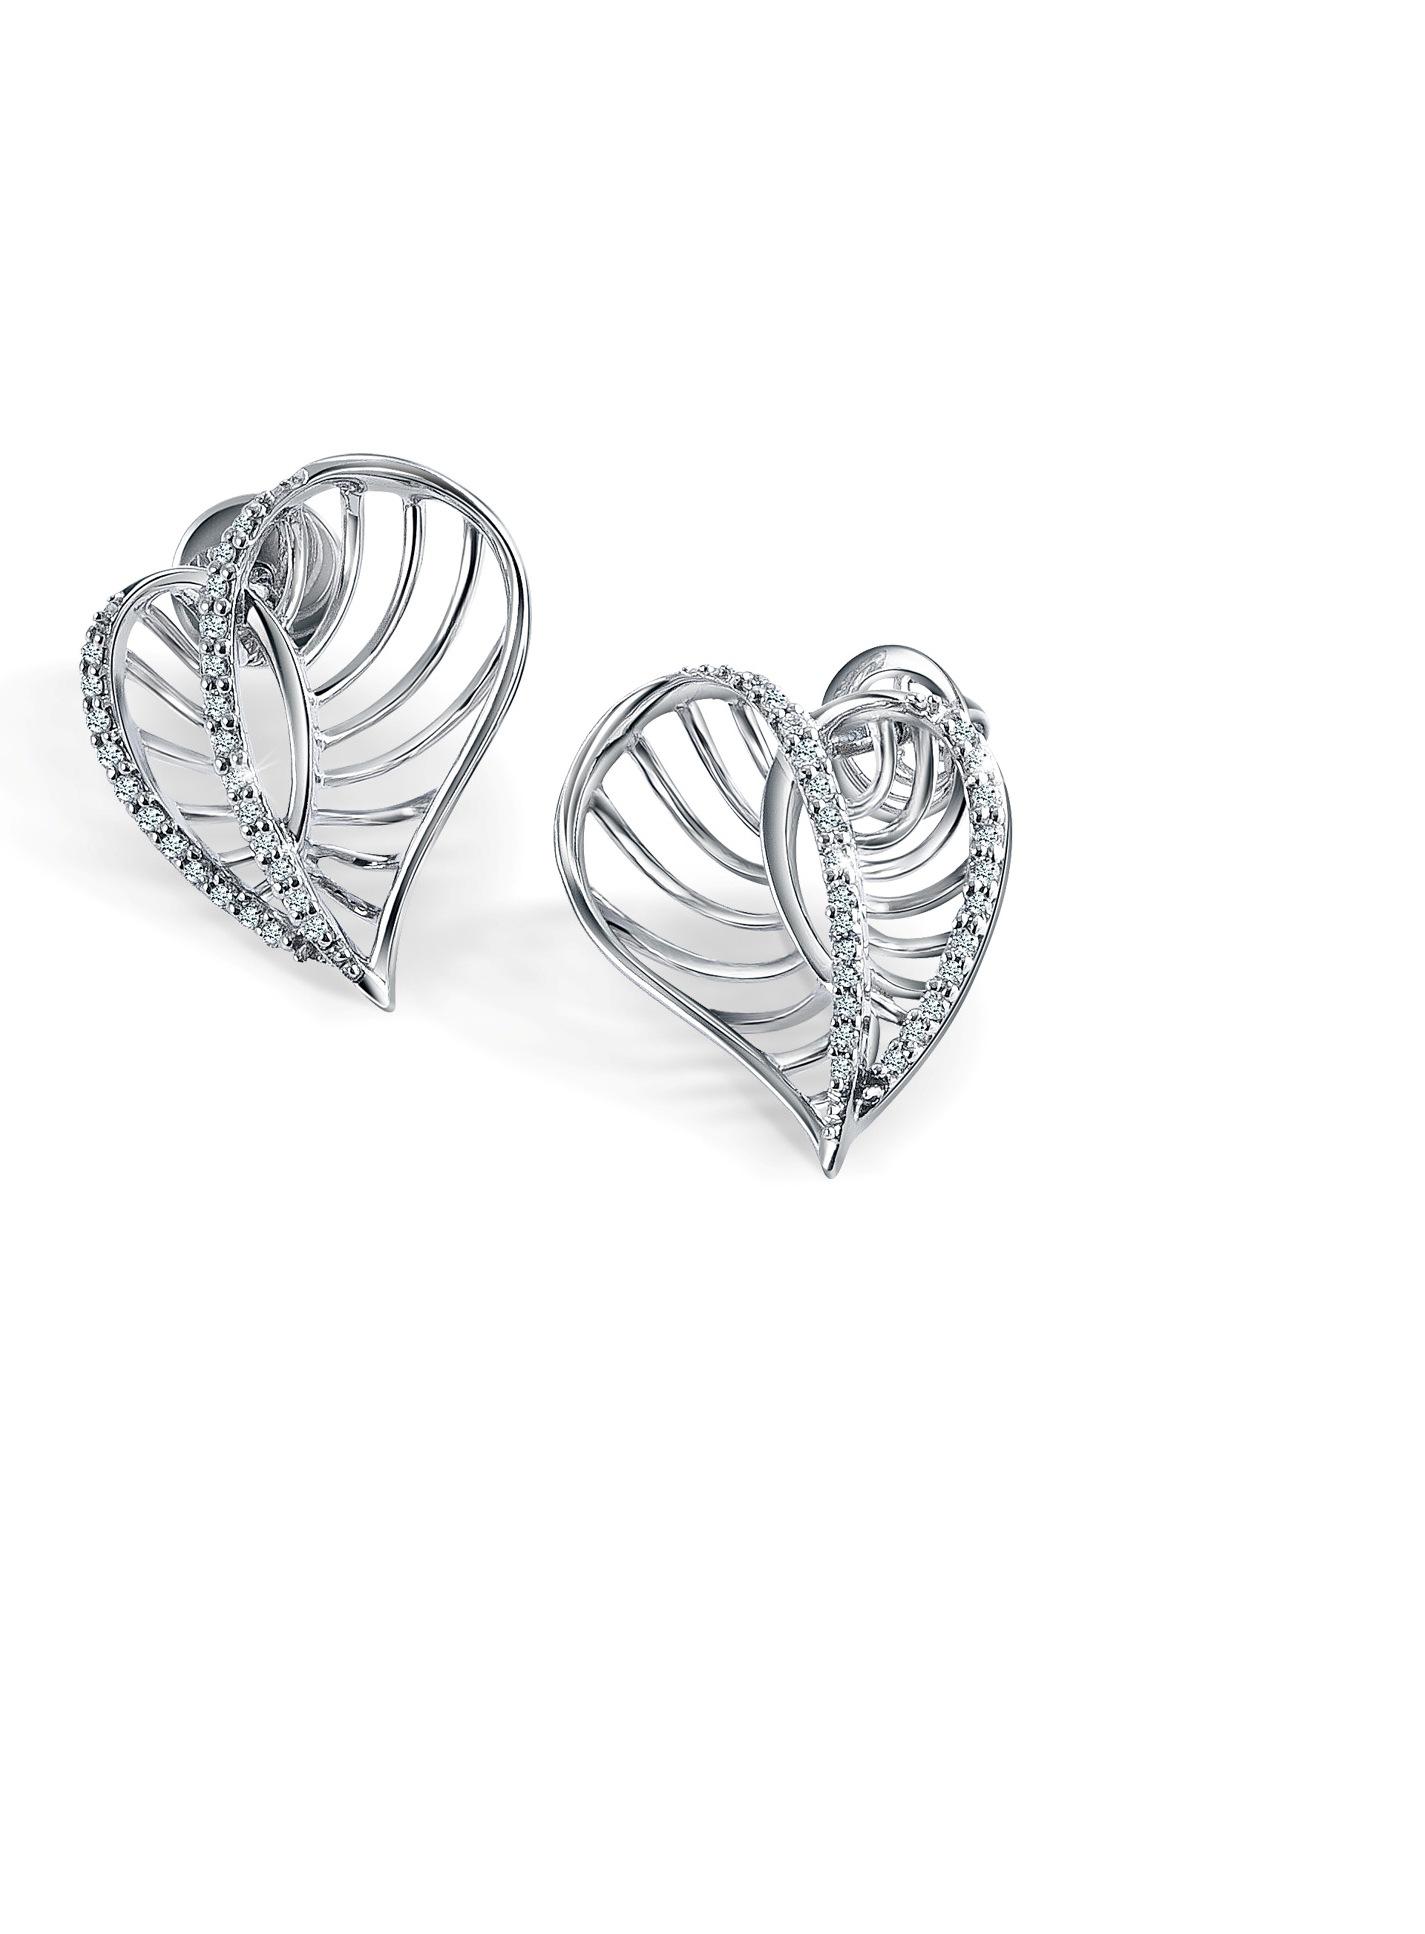 Heart Shaped Platinum Earrings